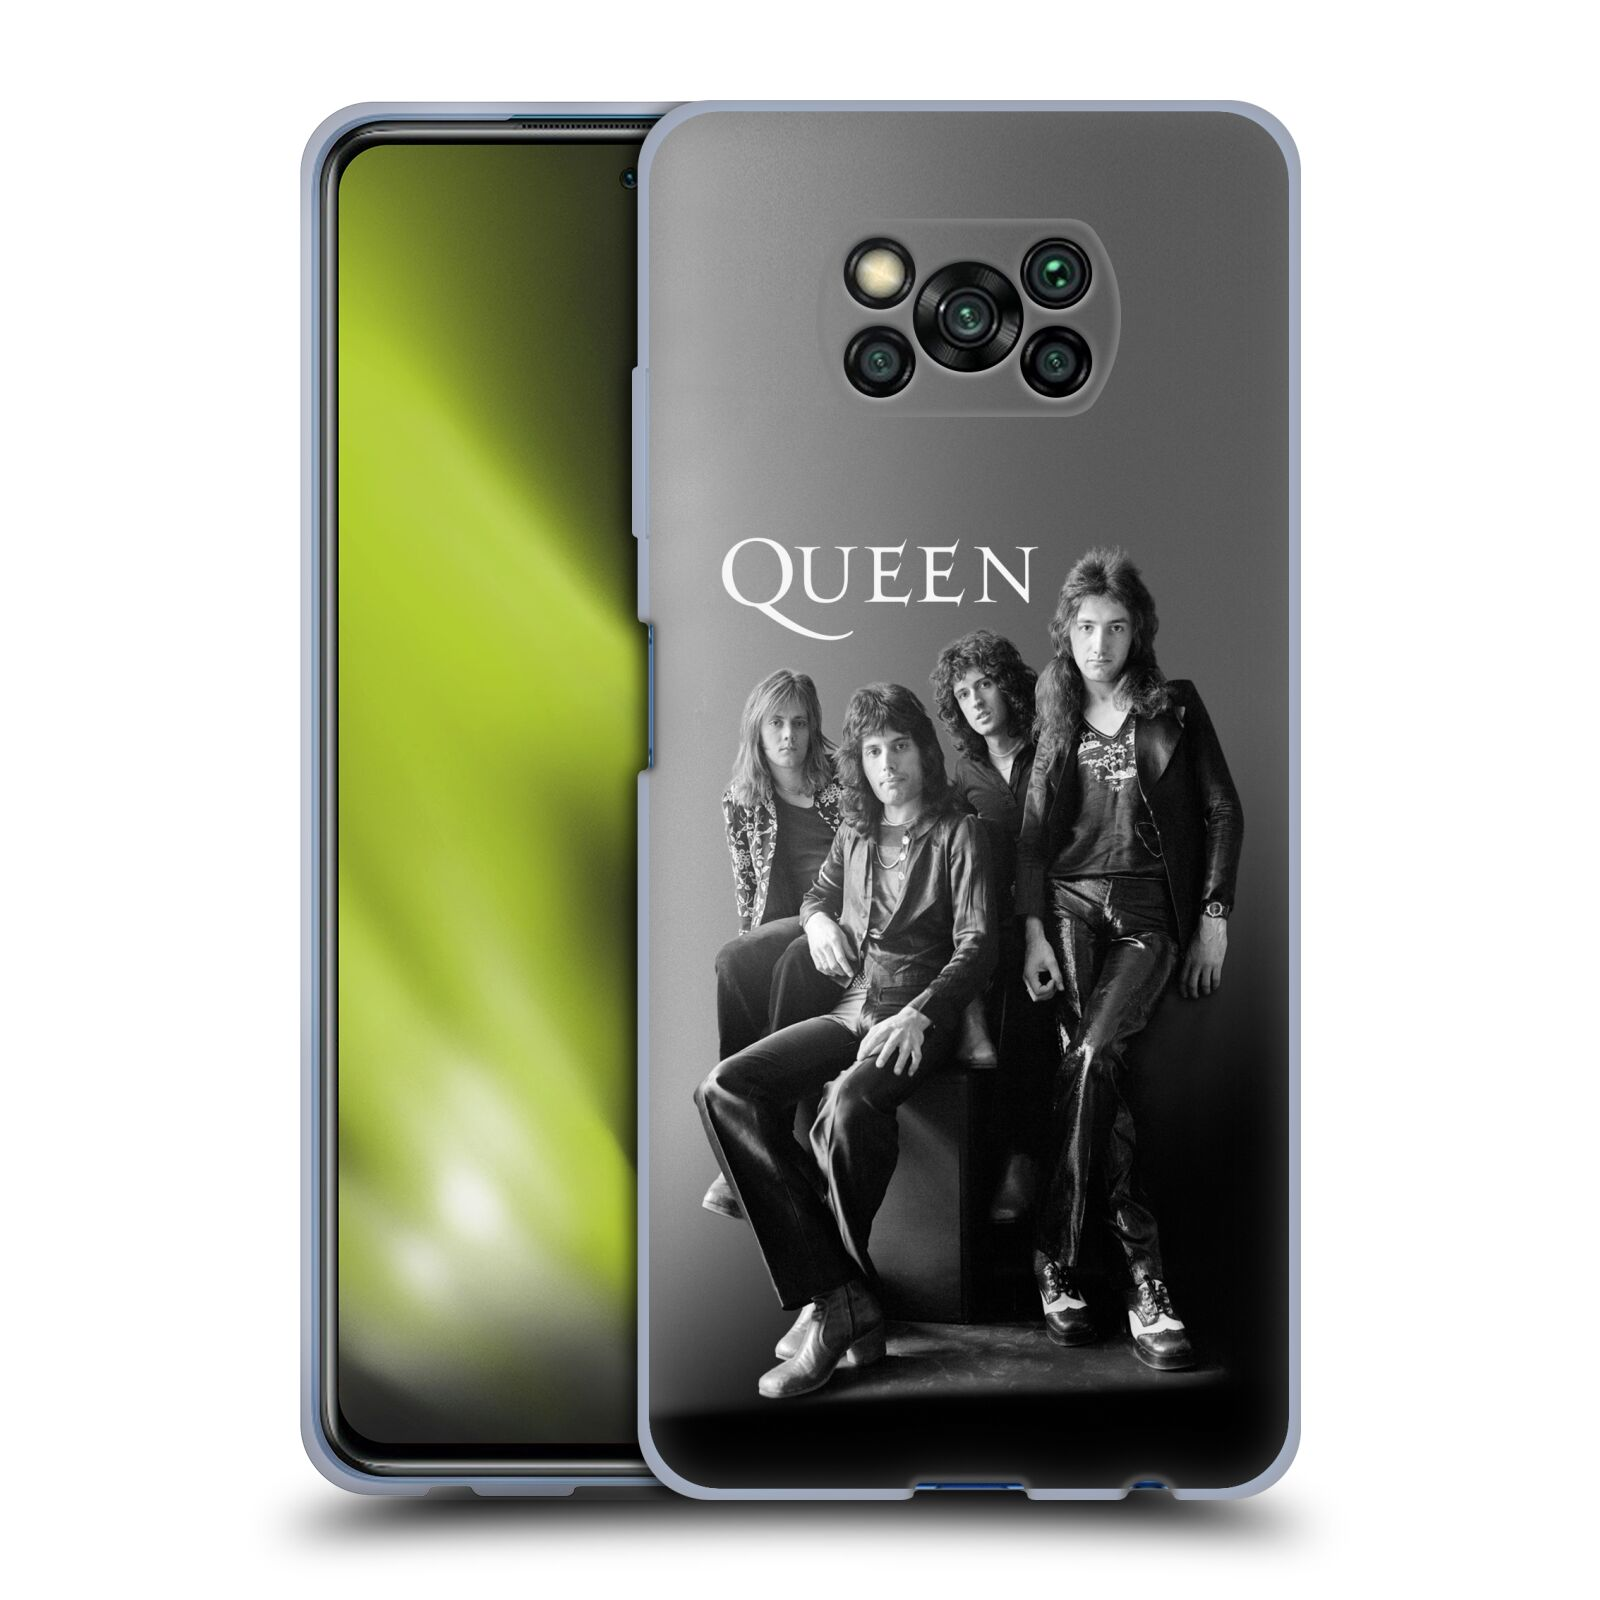 Silikonové pouzdro na mobil Xiaomi Poco X3 NFC - Head Case - Queen - Skupina